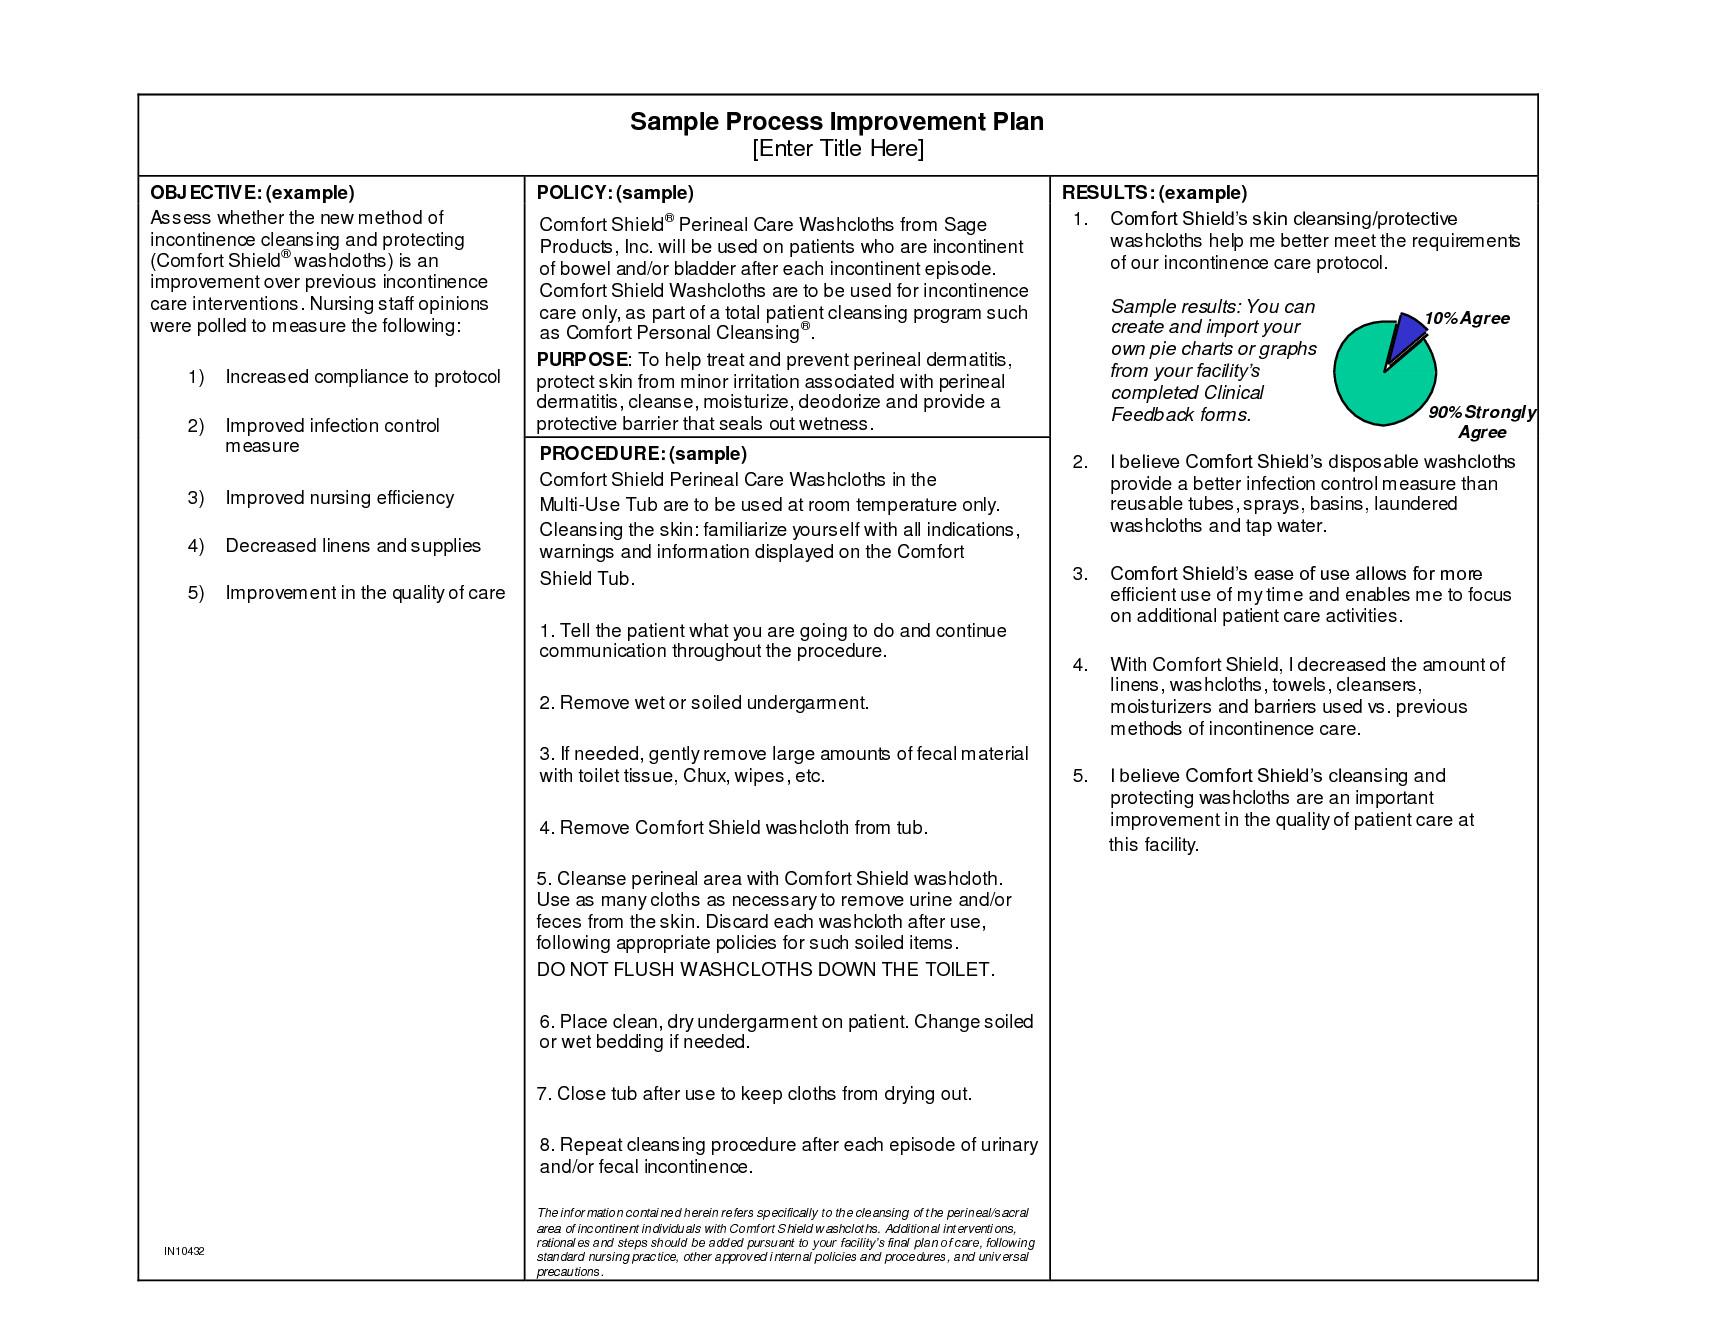 Process Improvement Plan Templates Business Process Improvement Plan Template 2010 the